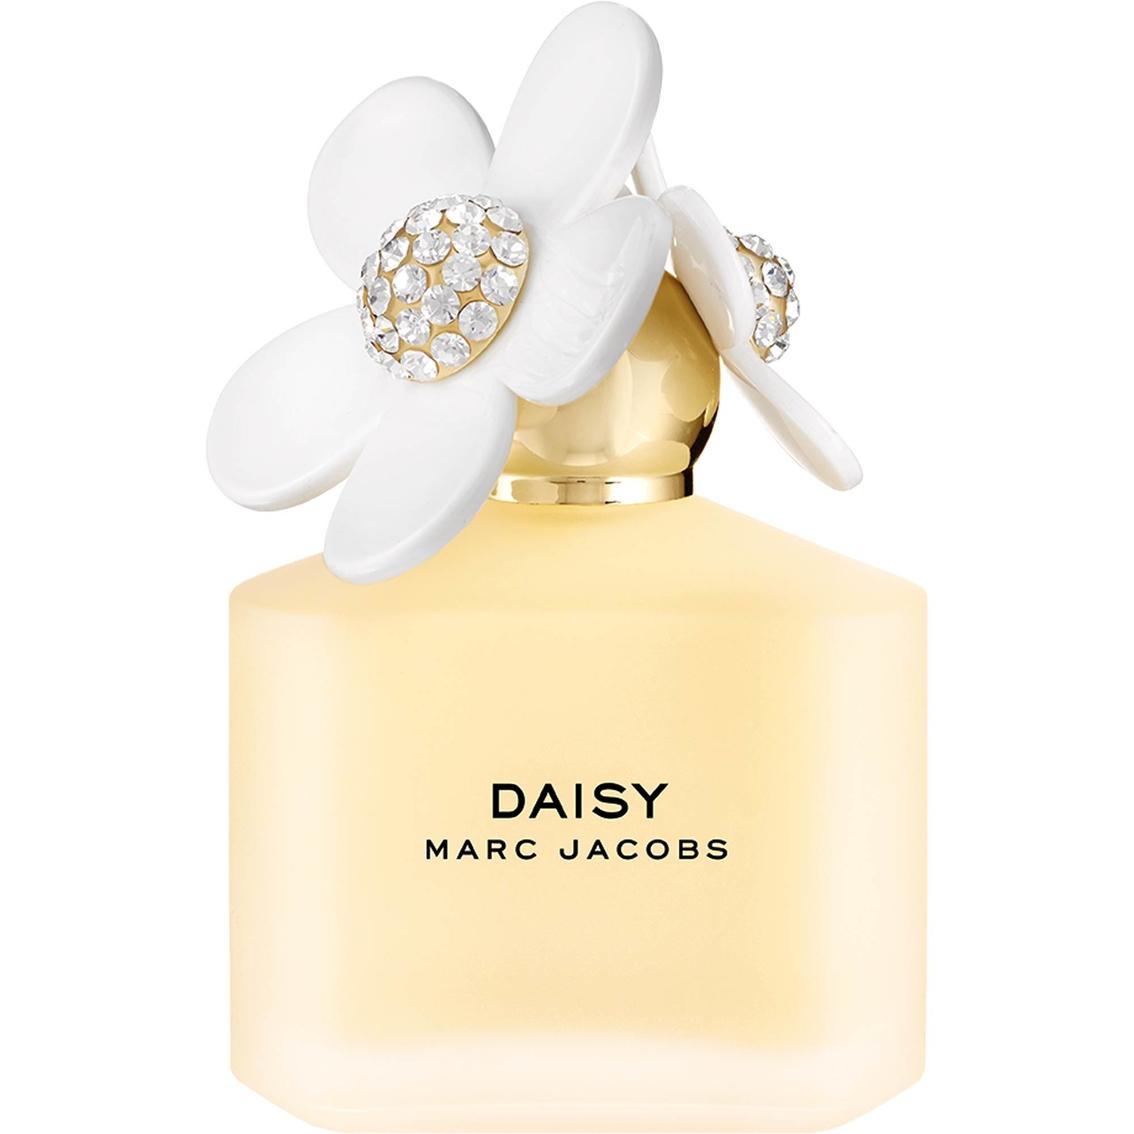 Marc jacobs daisy anniversary edition edt spray womens fragrances marc jacobs daisy anniversary edition edt spray izmirmasajfo